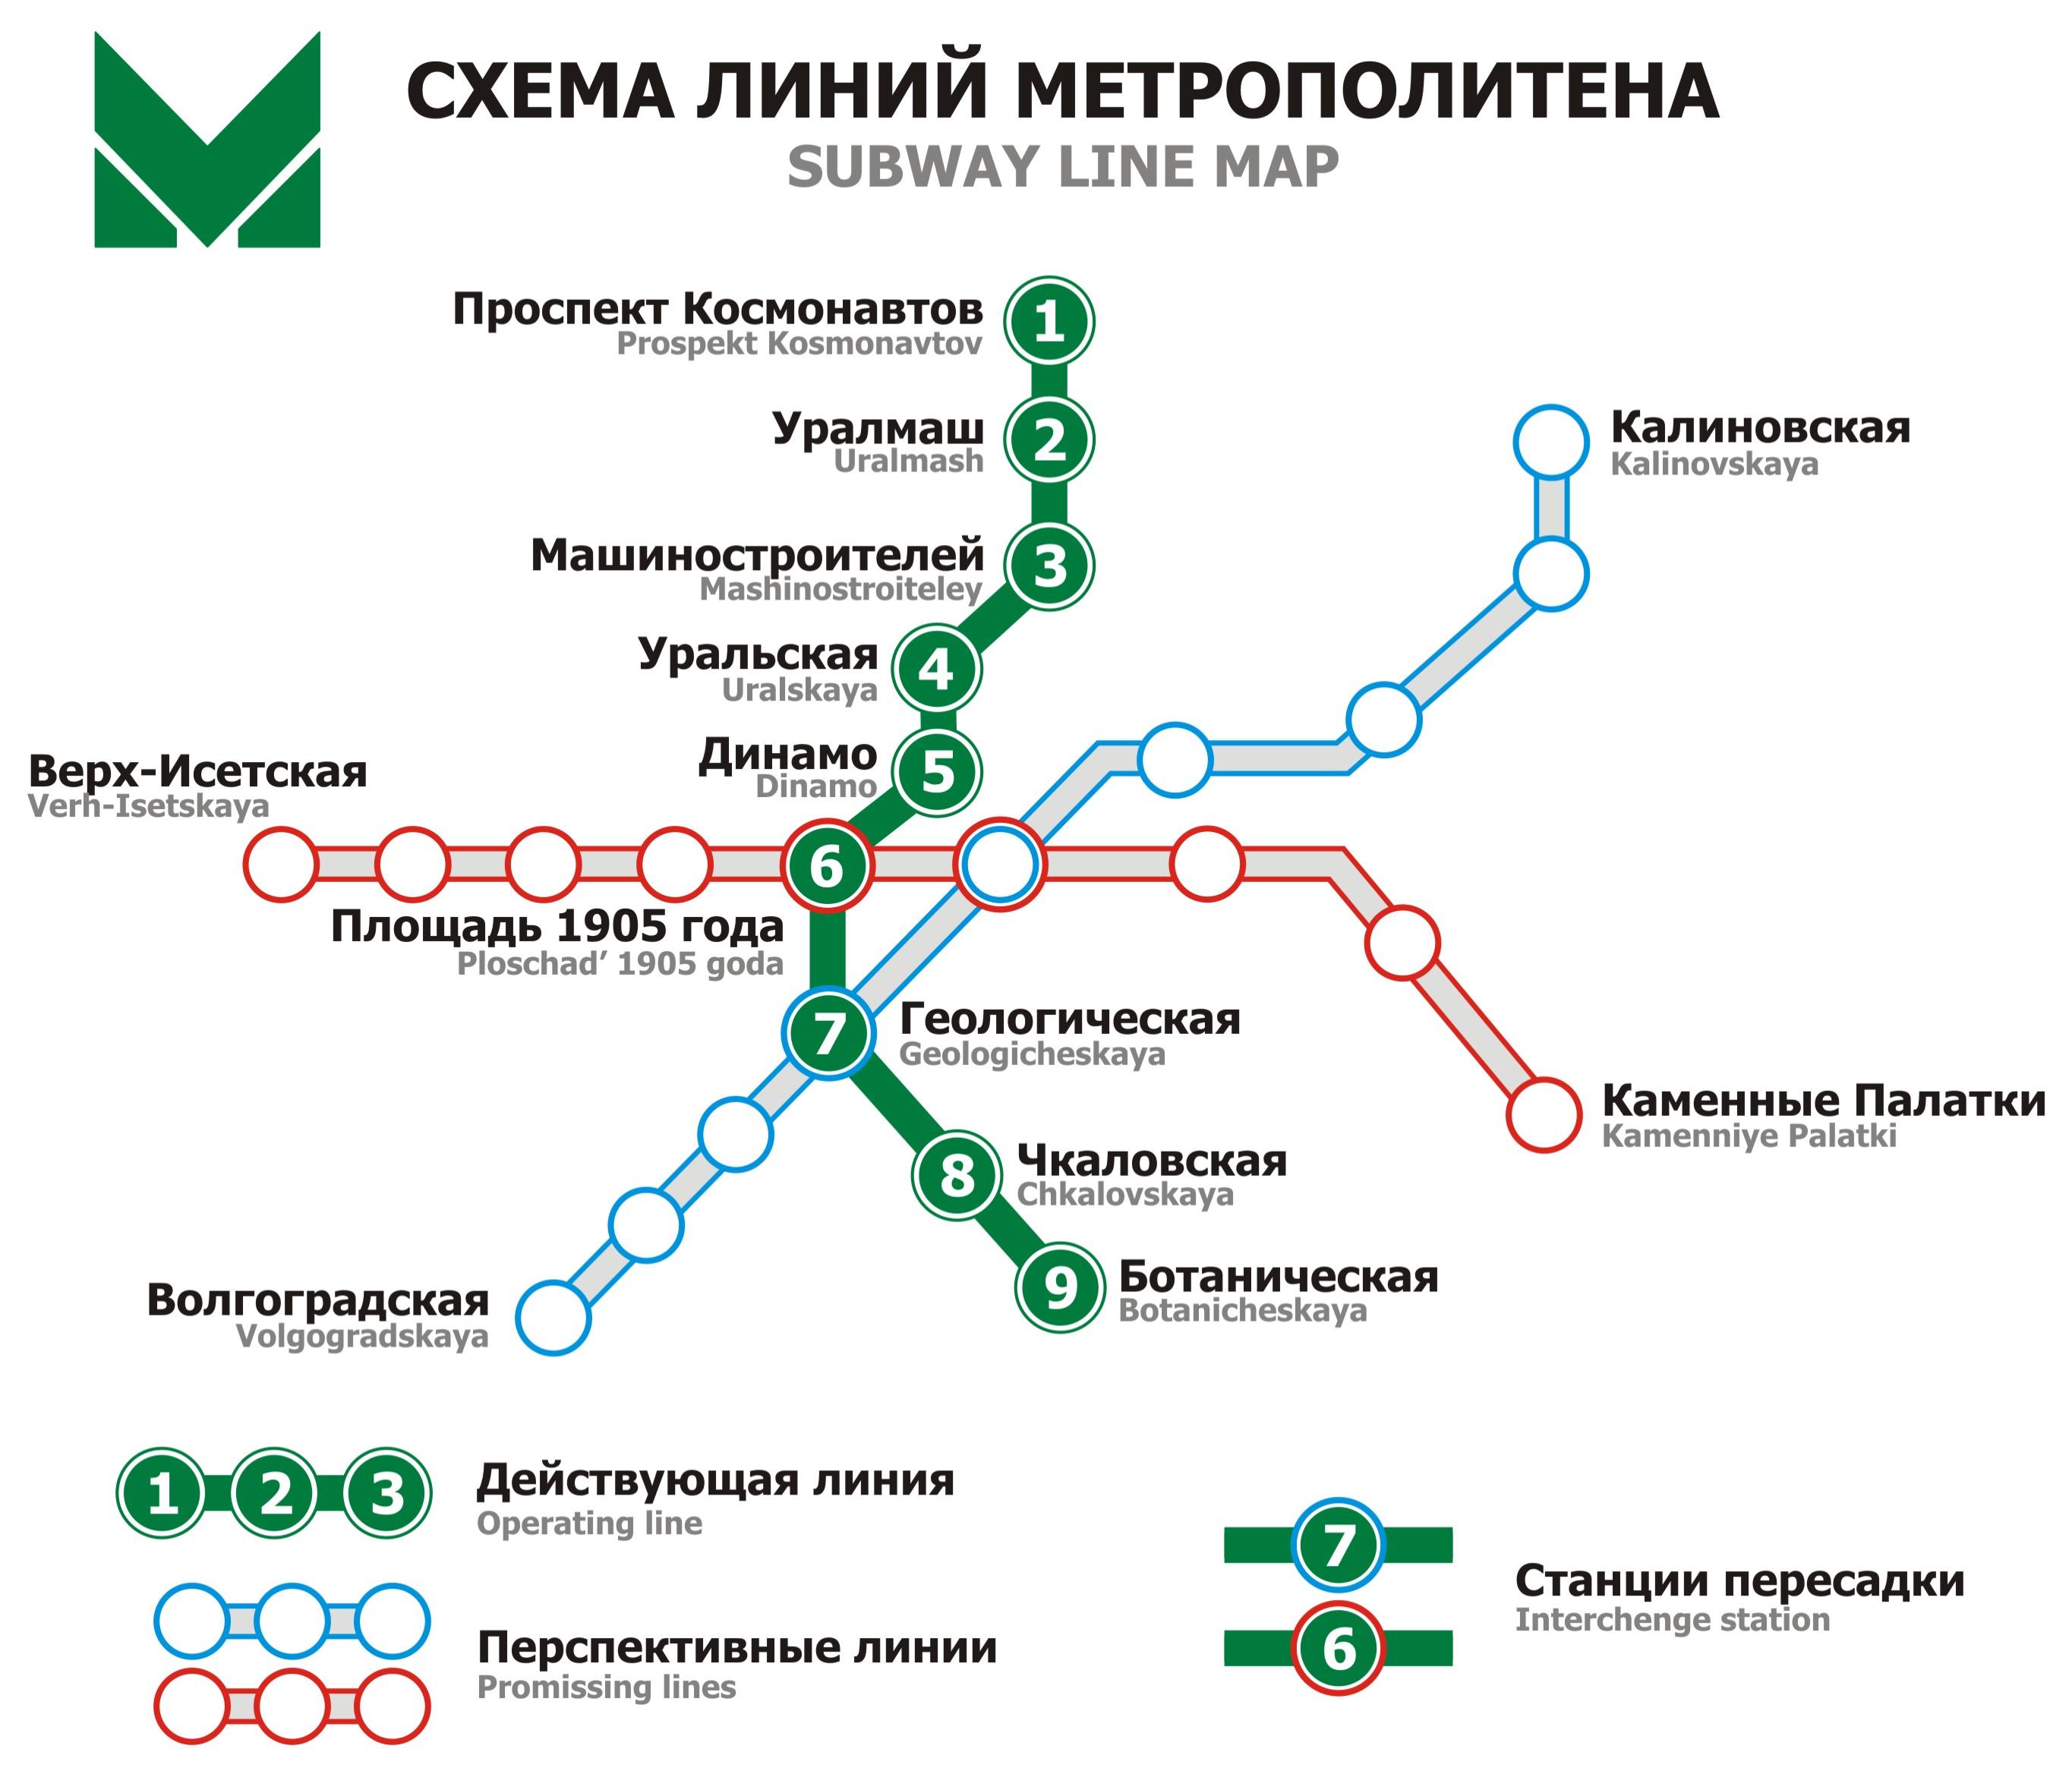 петербургский метрополитен схемы 1980